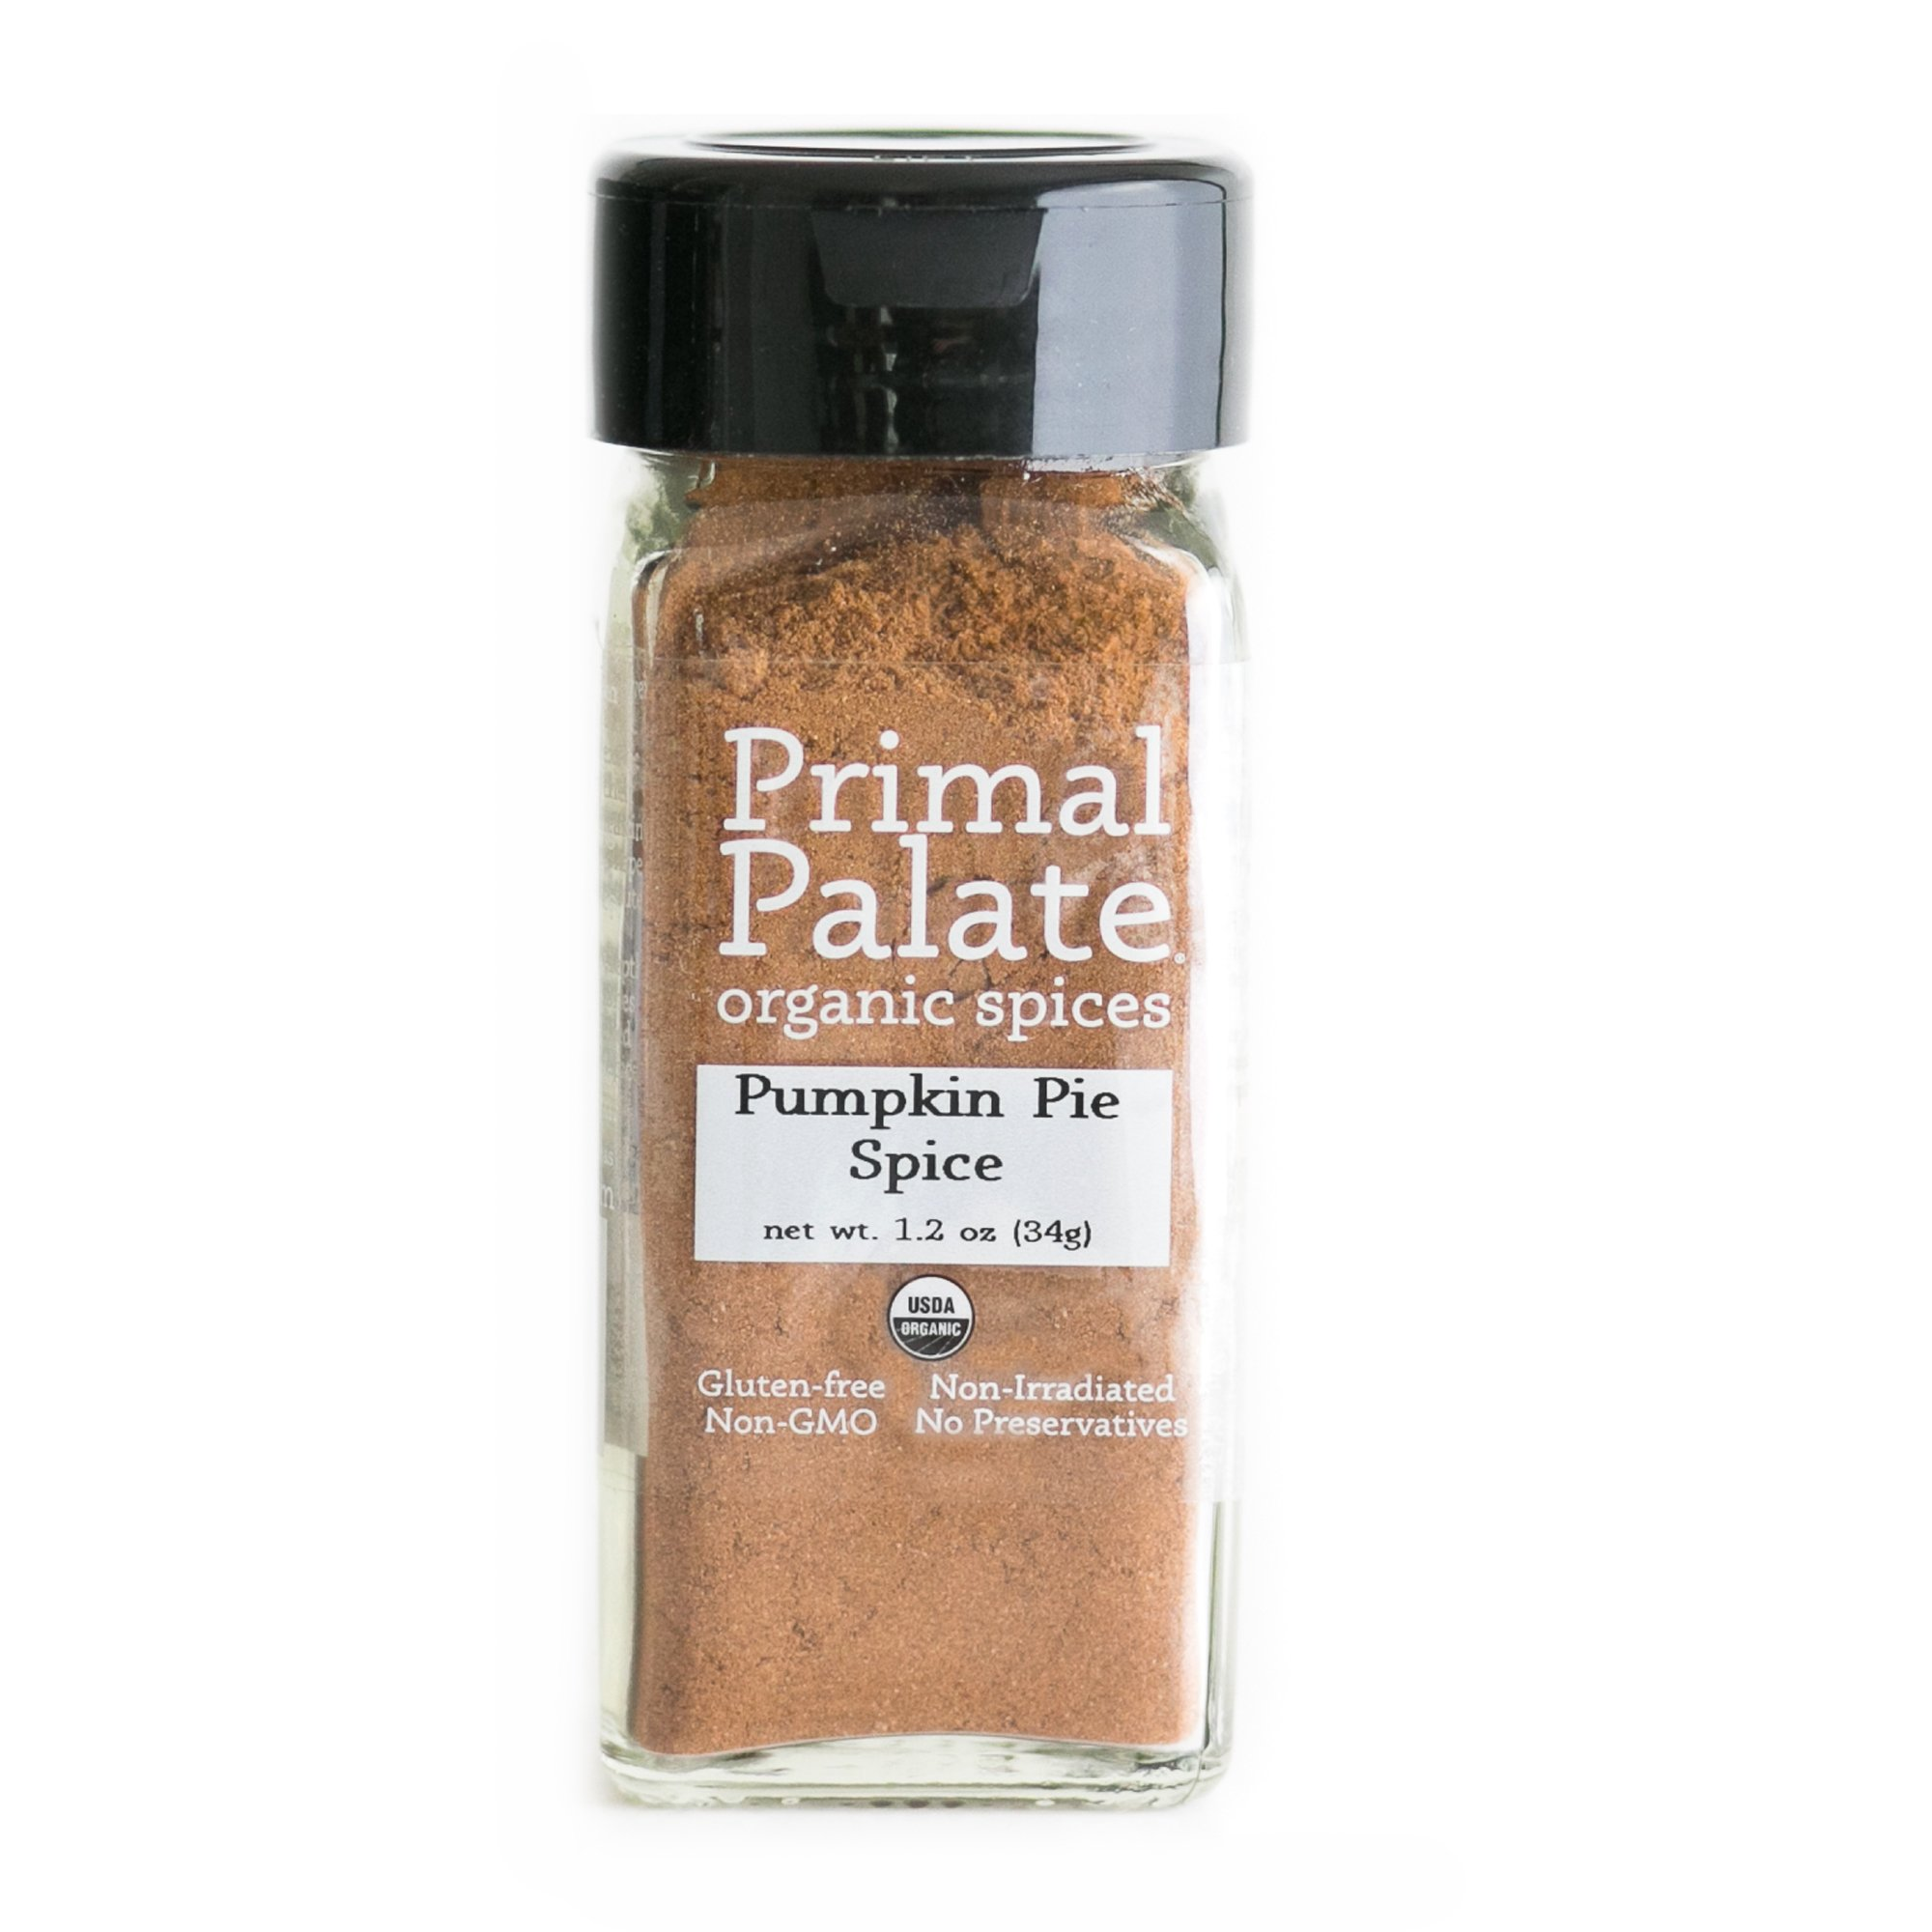 Primal Palate Organic Spices Pumpkin Pie Spice, Certified Organic, 1.2 oz Bottle